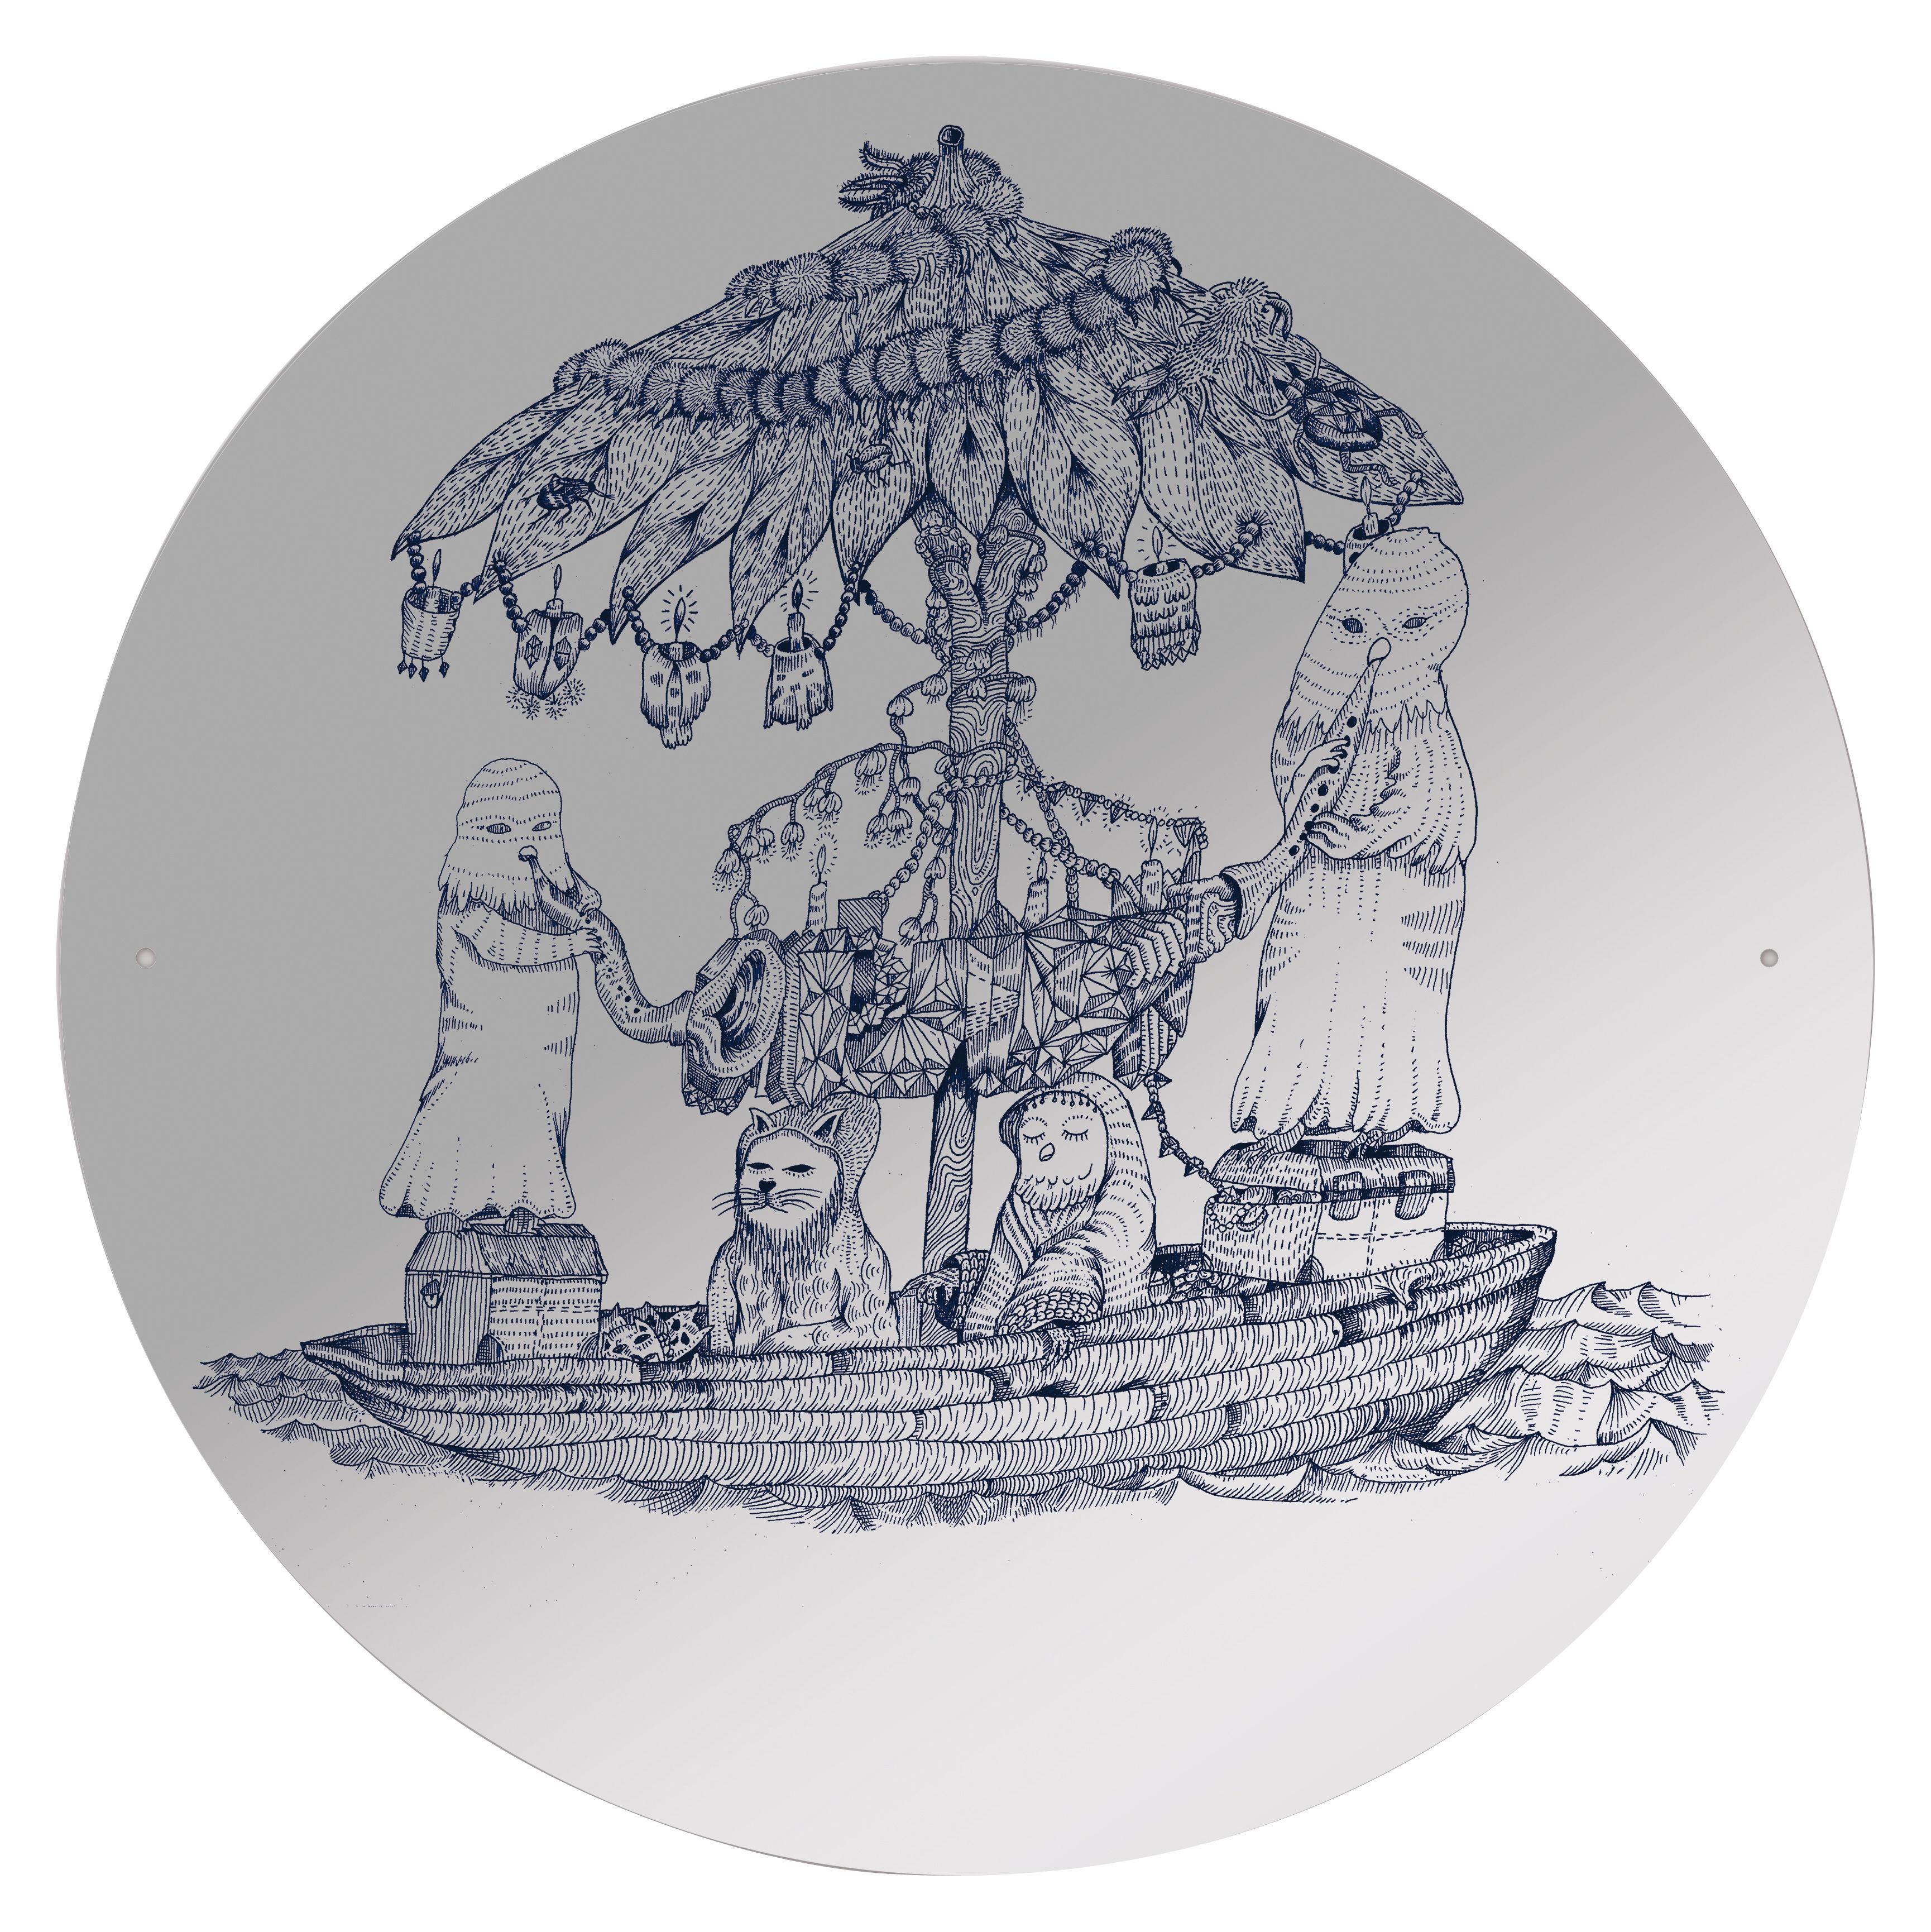 Furniture - Mirrors - Opulant boat self-sticking mirror - Self-adhesive by Domestic - Opulant boat pattern - Plastic material